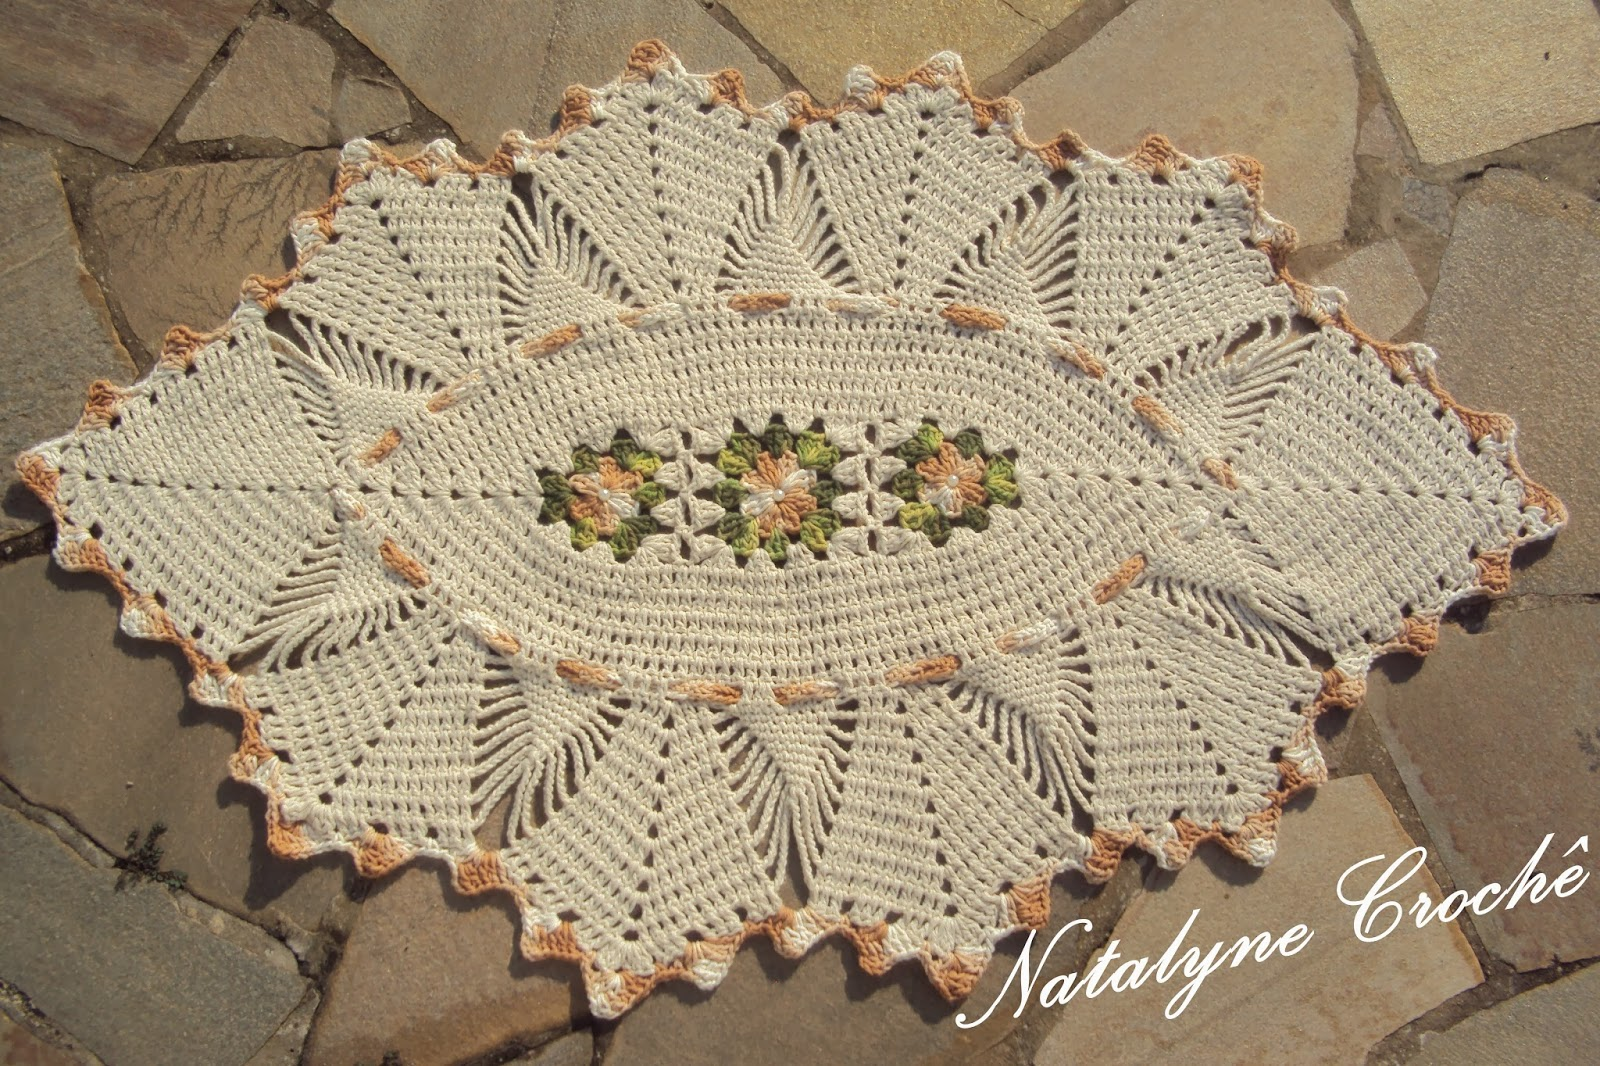 Tapete Oval De Cr ~ Natalyne Croch u00ea Tapete oval com flor rasteira